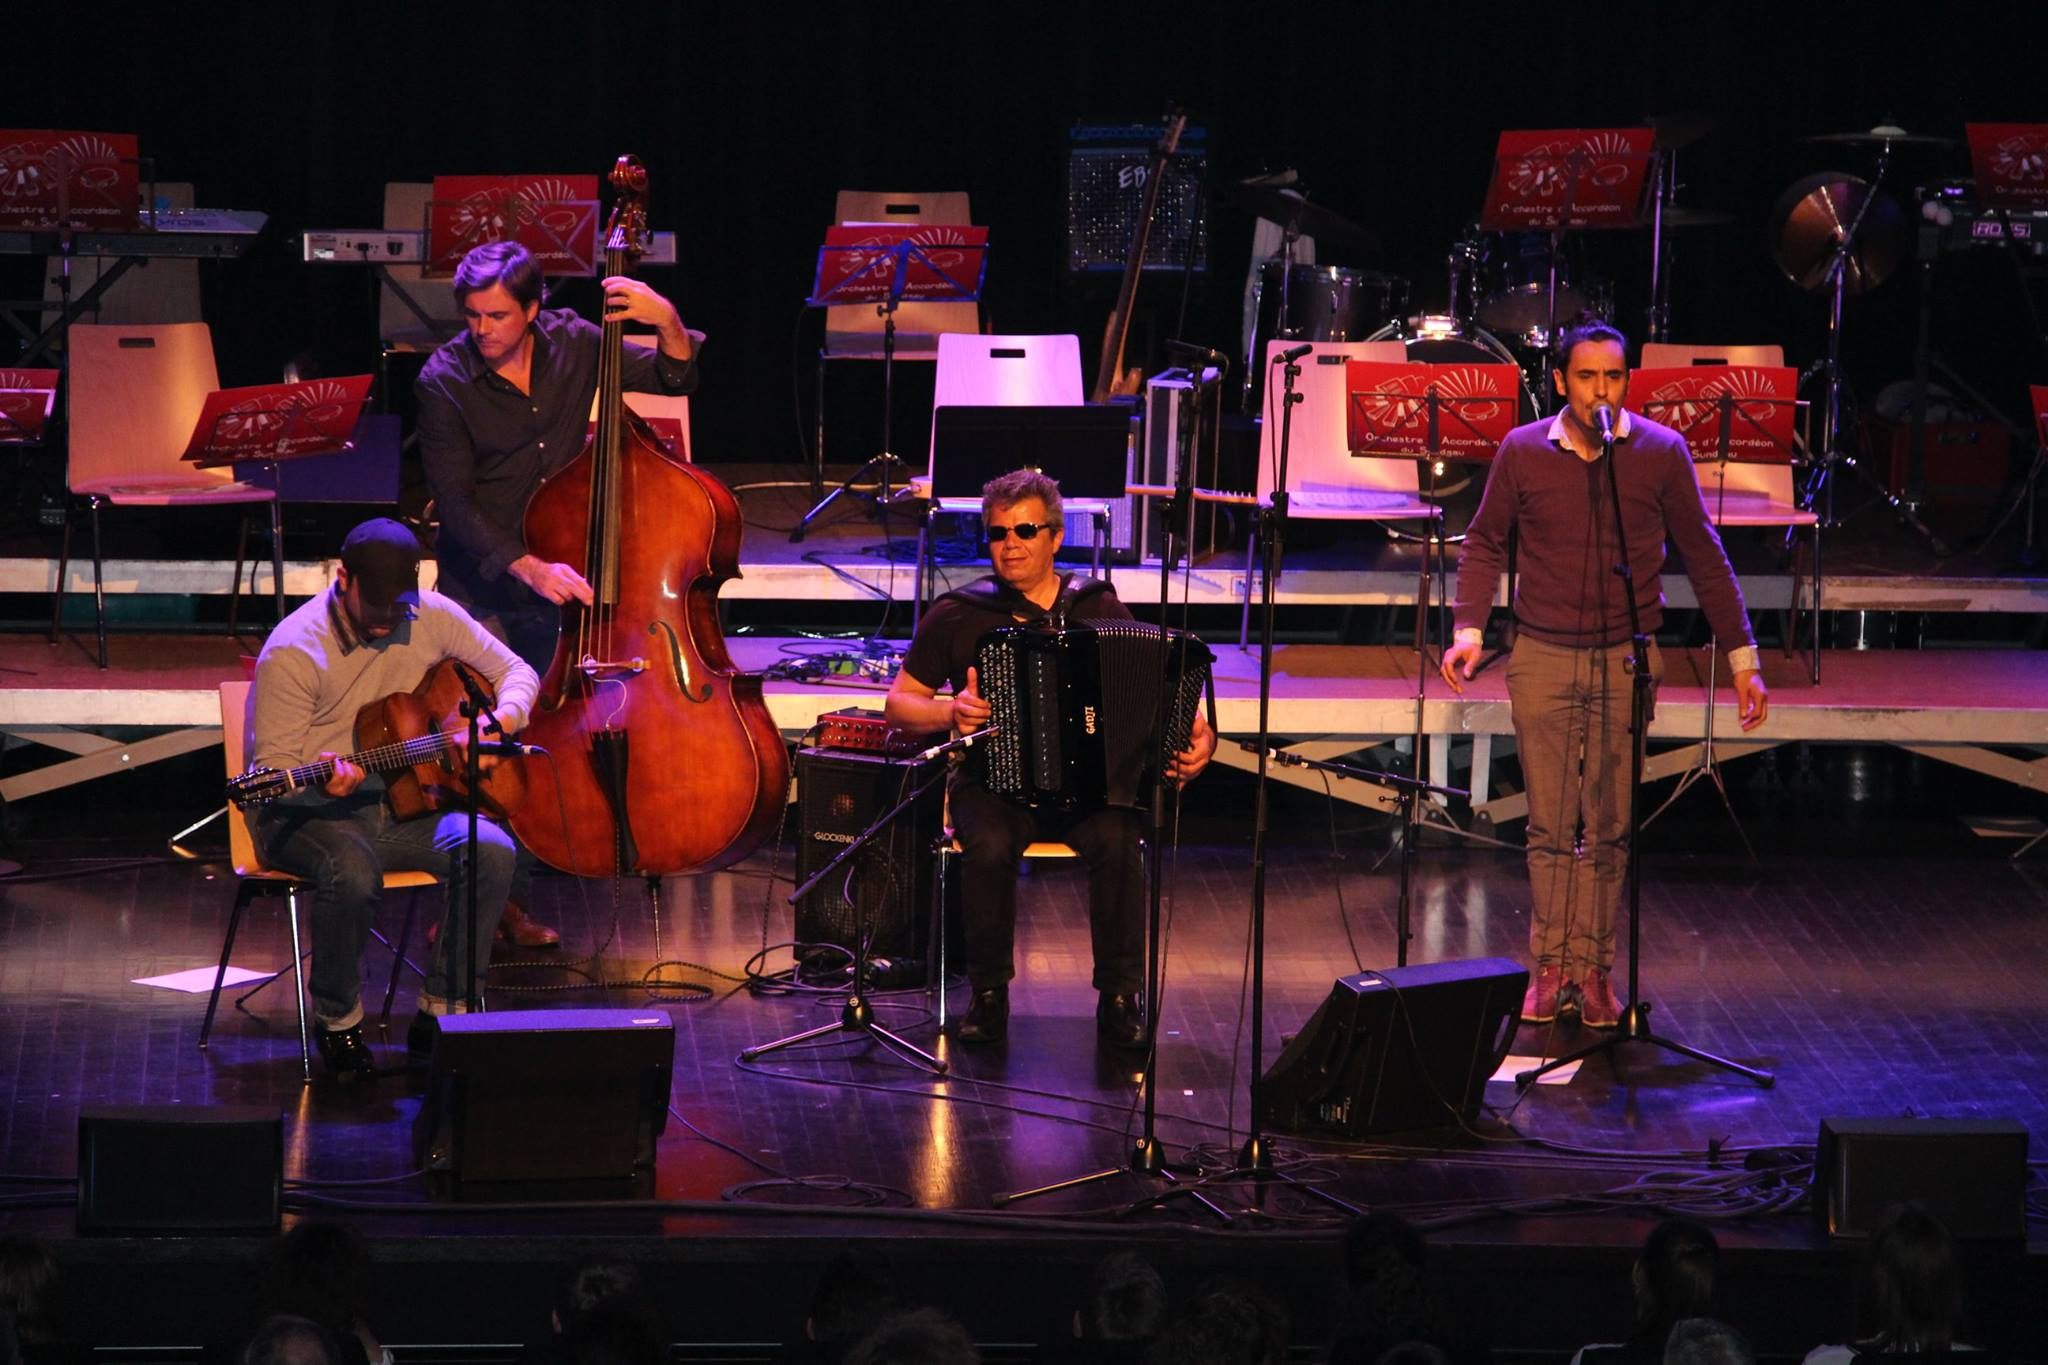 Gala  50ème anniversaire - Marcel Loeffler Trio -  La Comète - 25 mars 2017